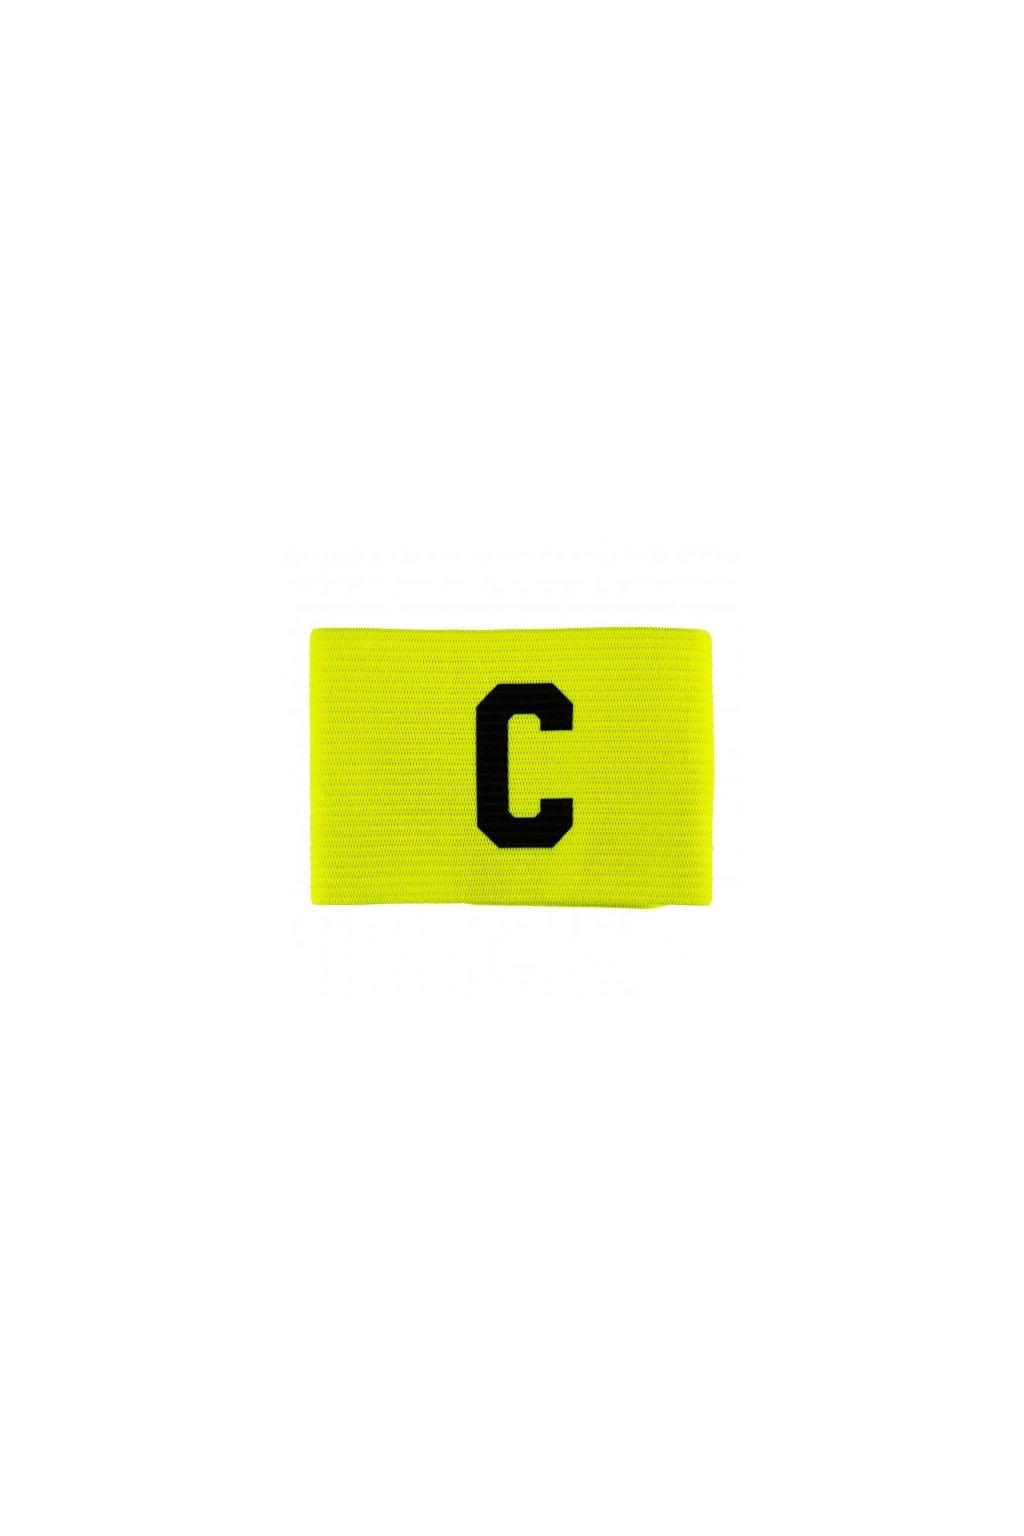 salming team captain armband fluo yellow